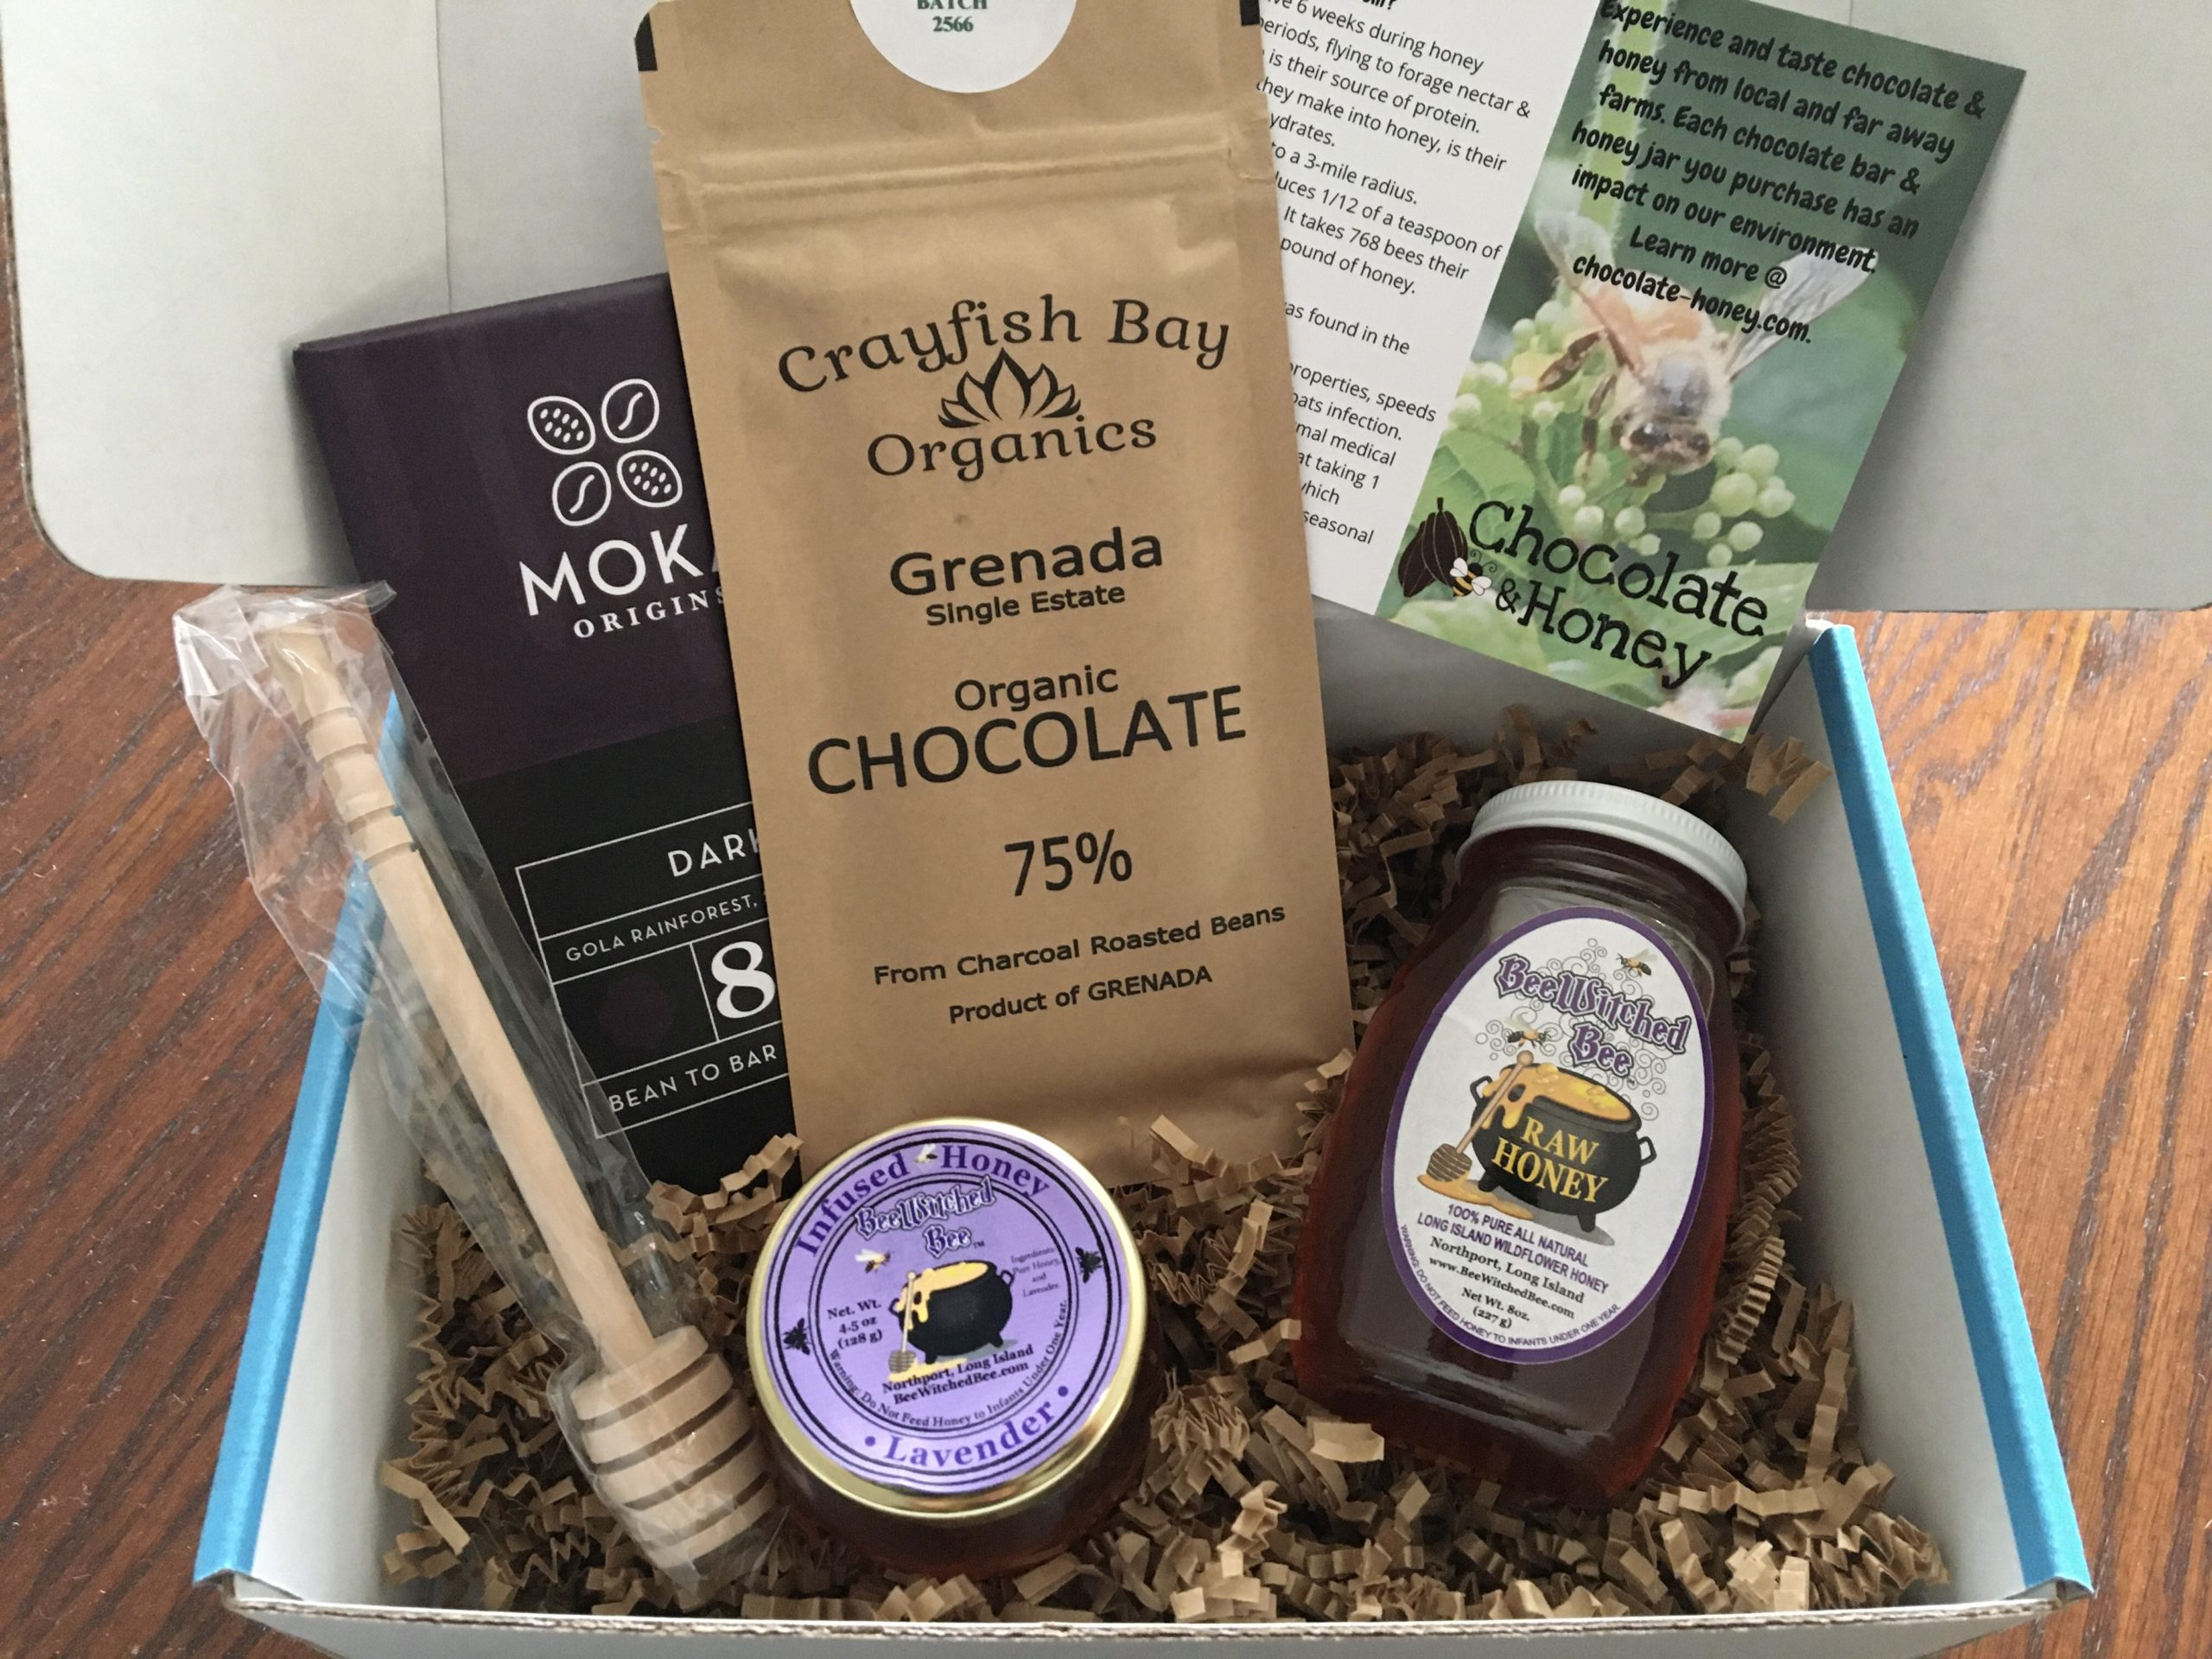 Chocolate & Honey Box A